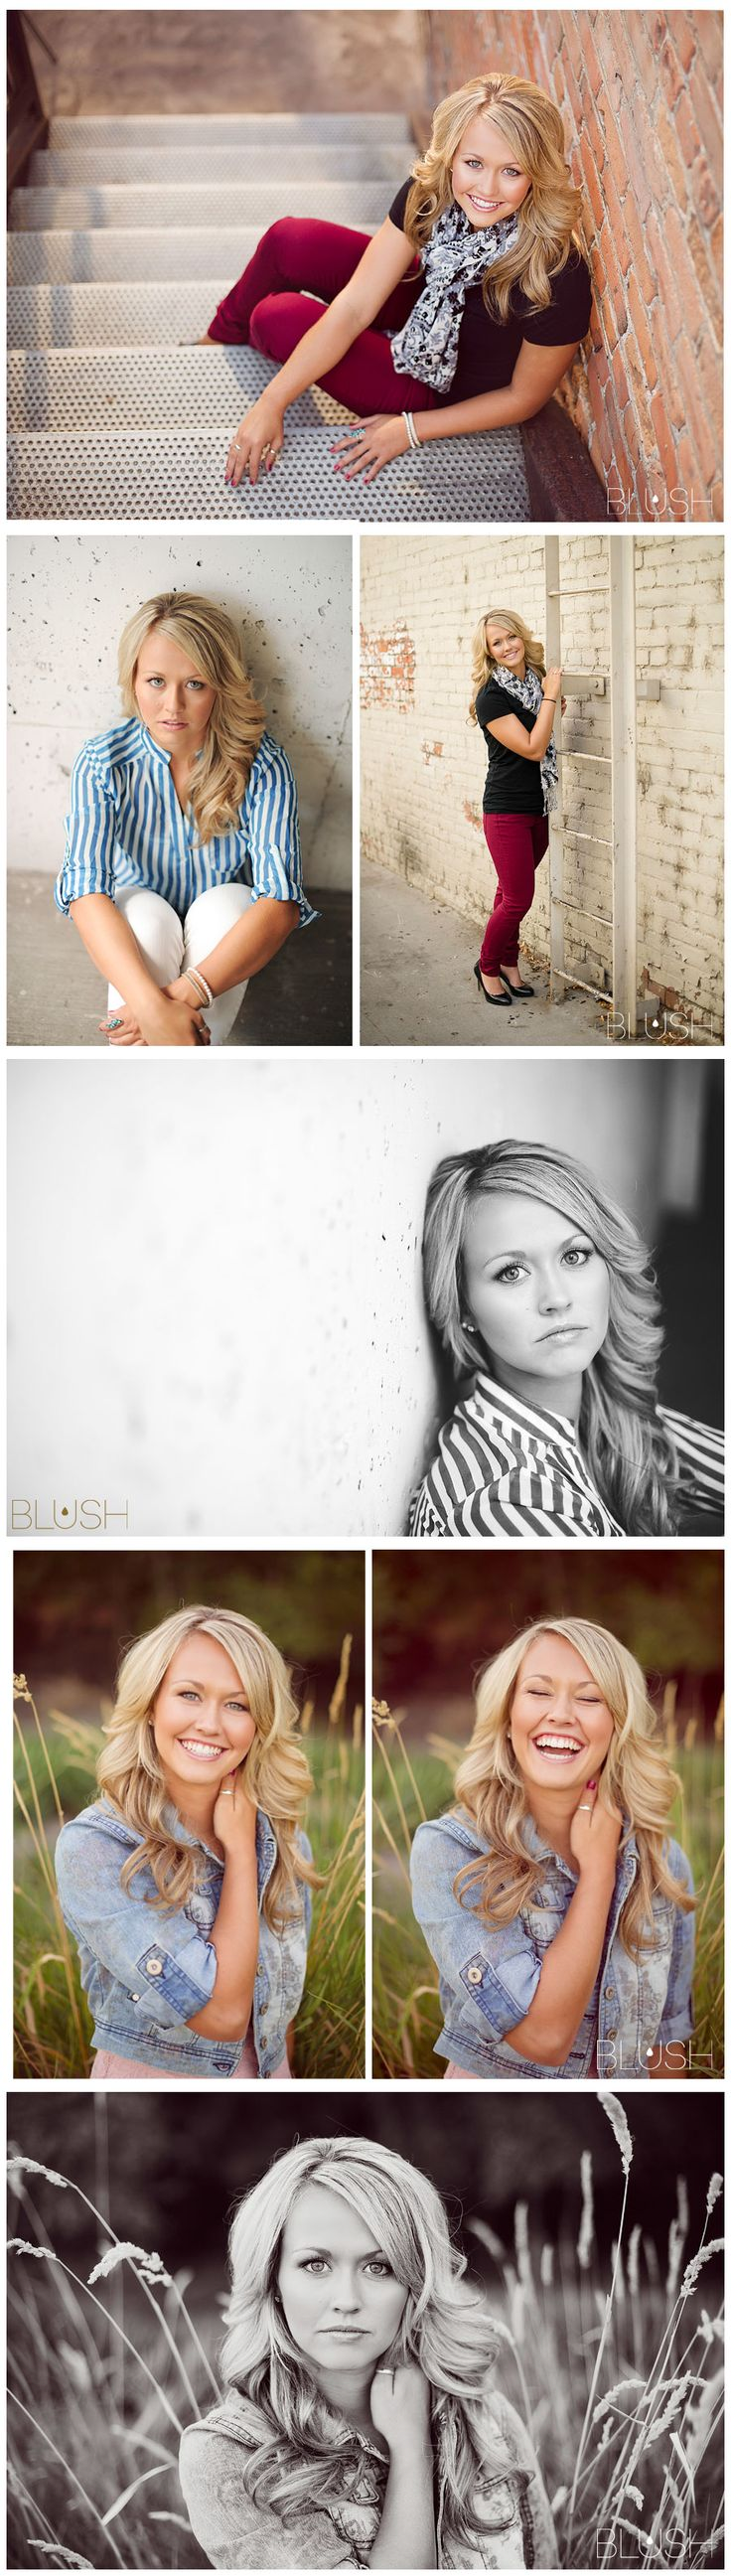 alex-senior-photographer-billings-montana.jpg 900×3,172 pixels